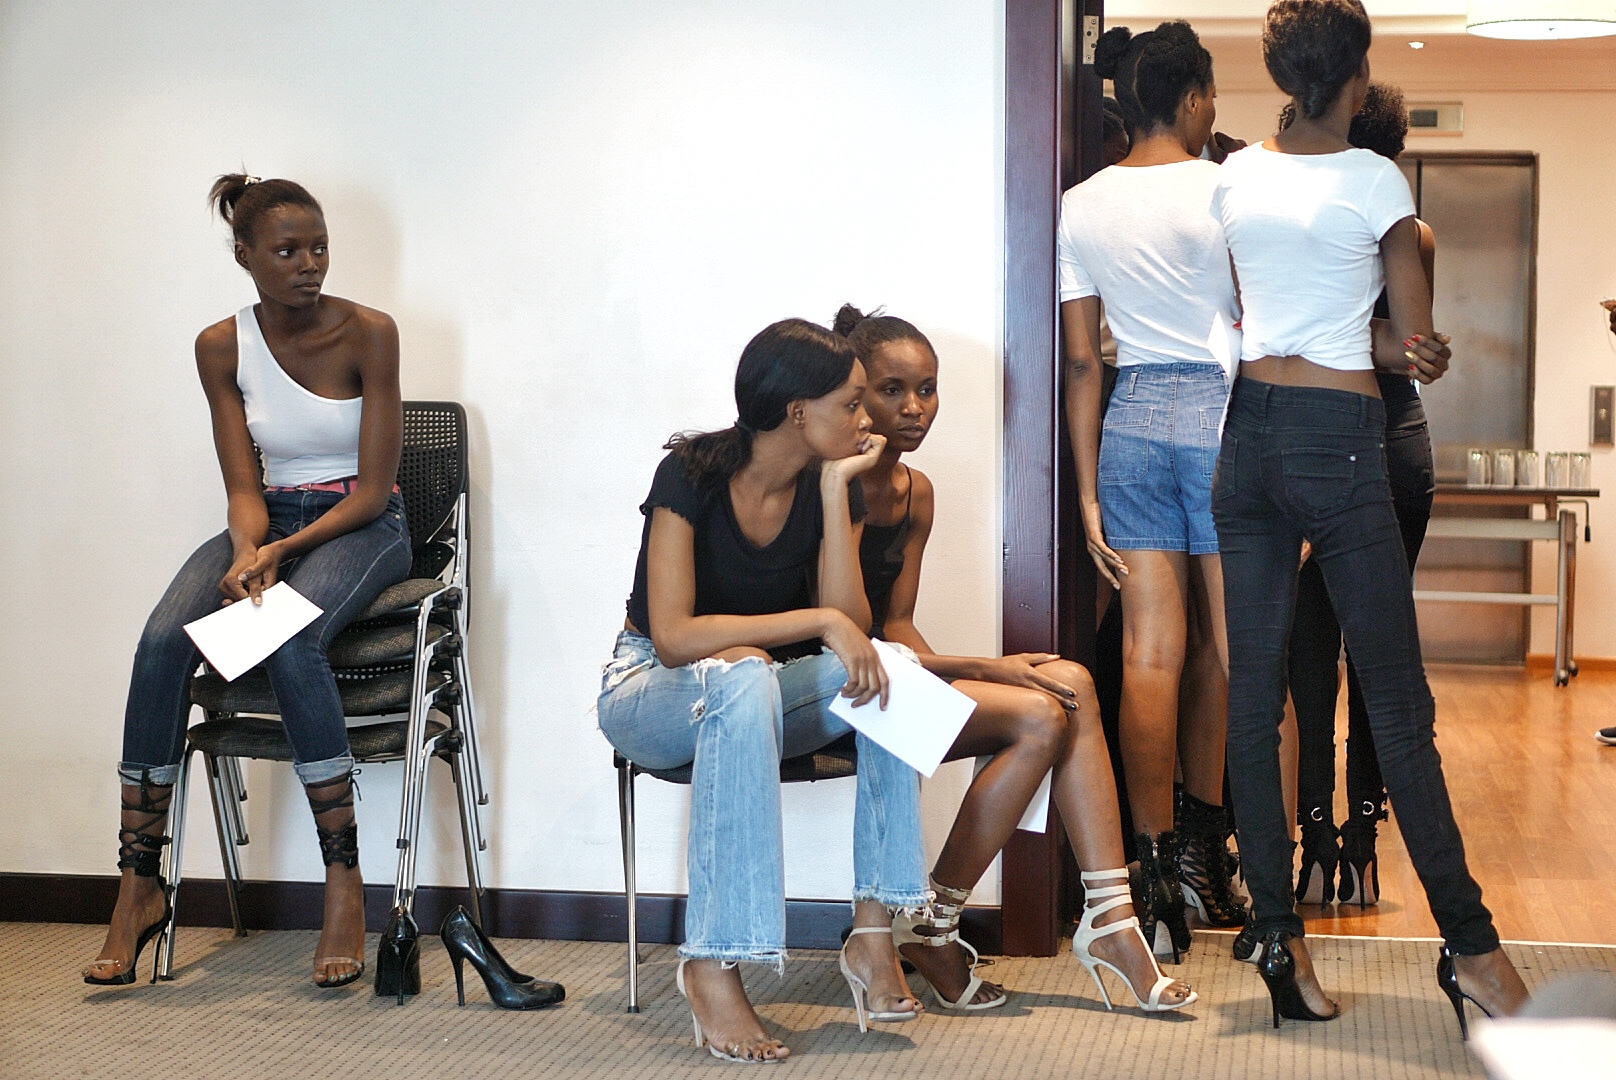 Models at gtbank fashion weekend casting 2017